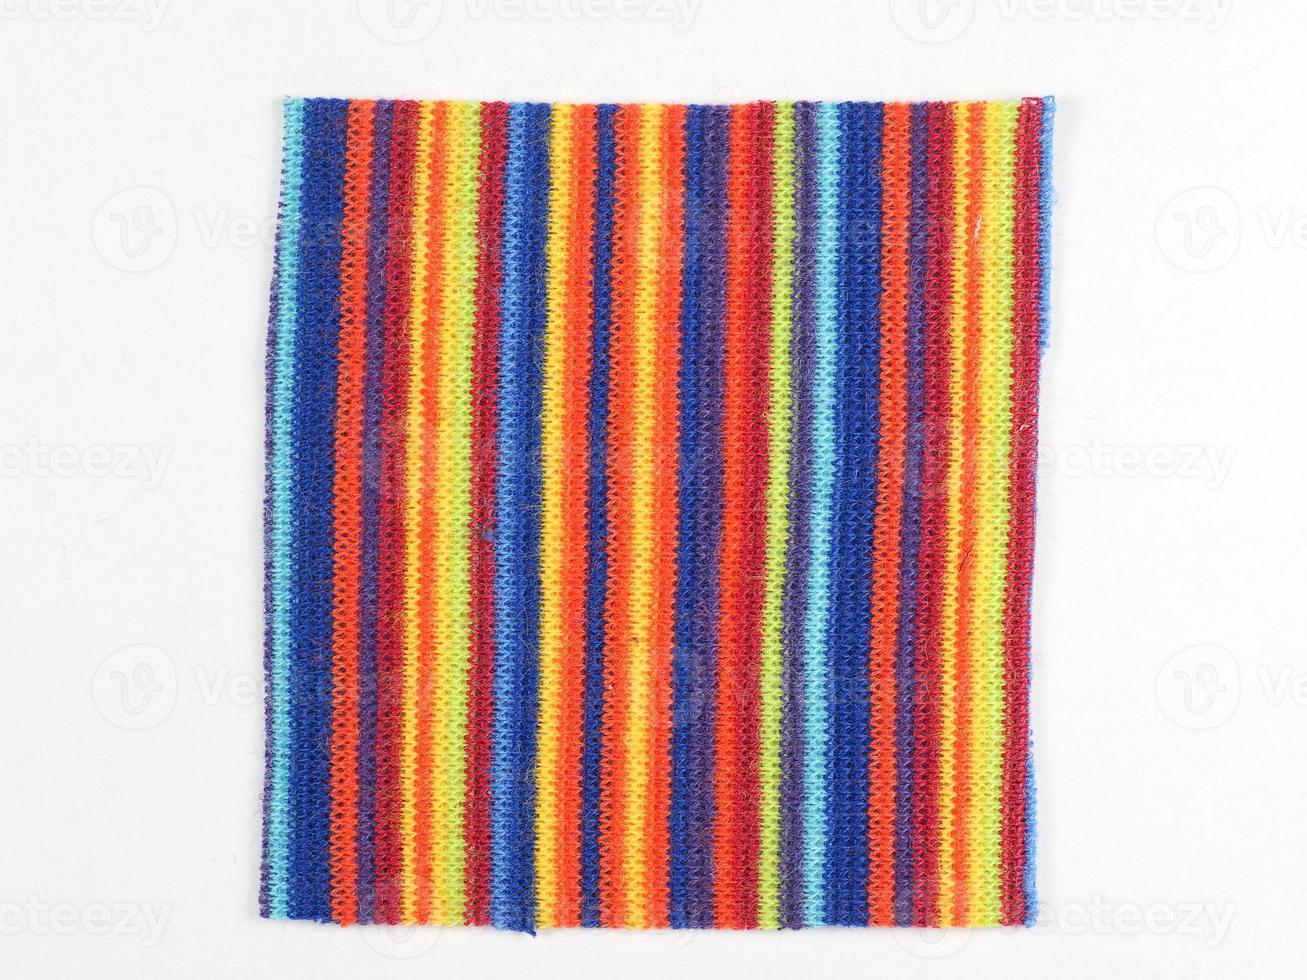 amostra de tecido multicolorido foto